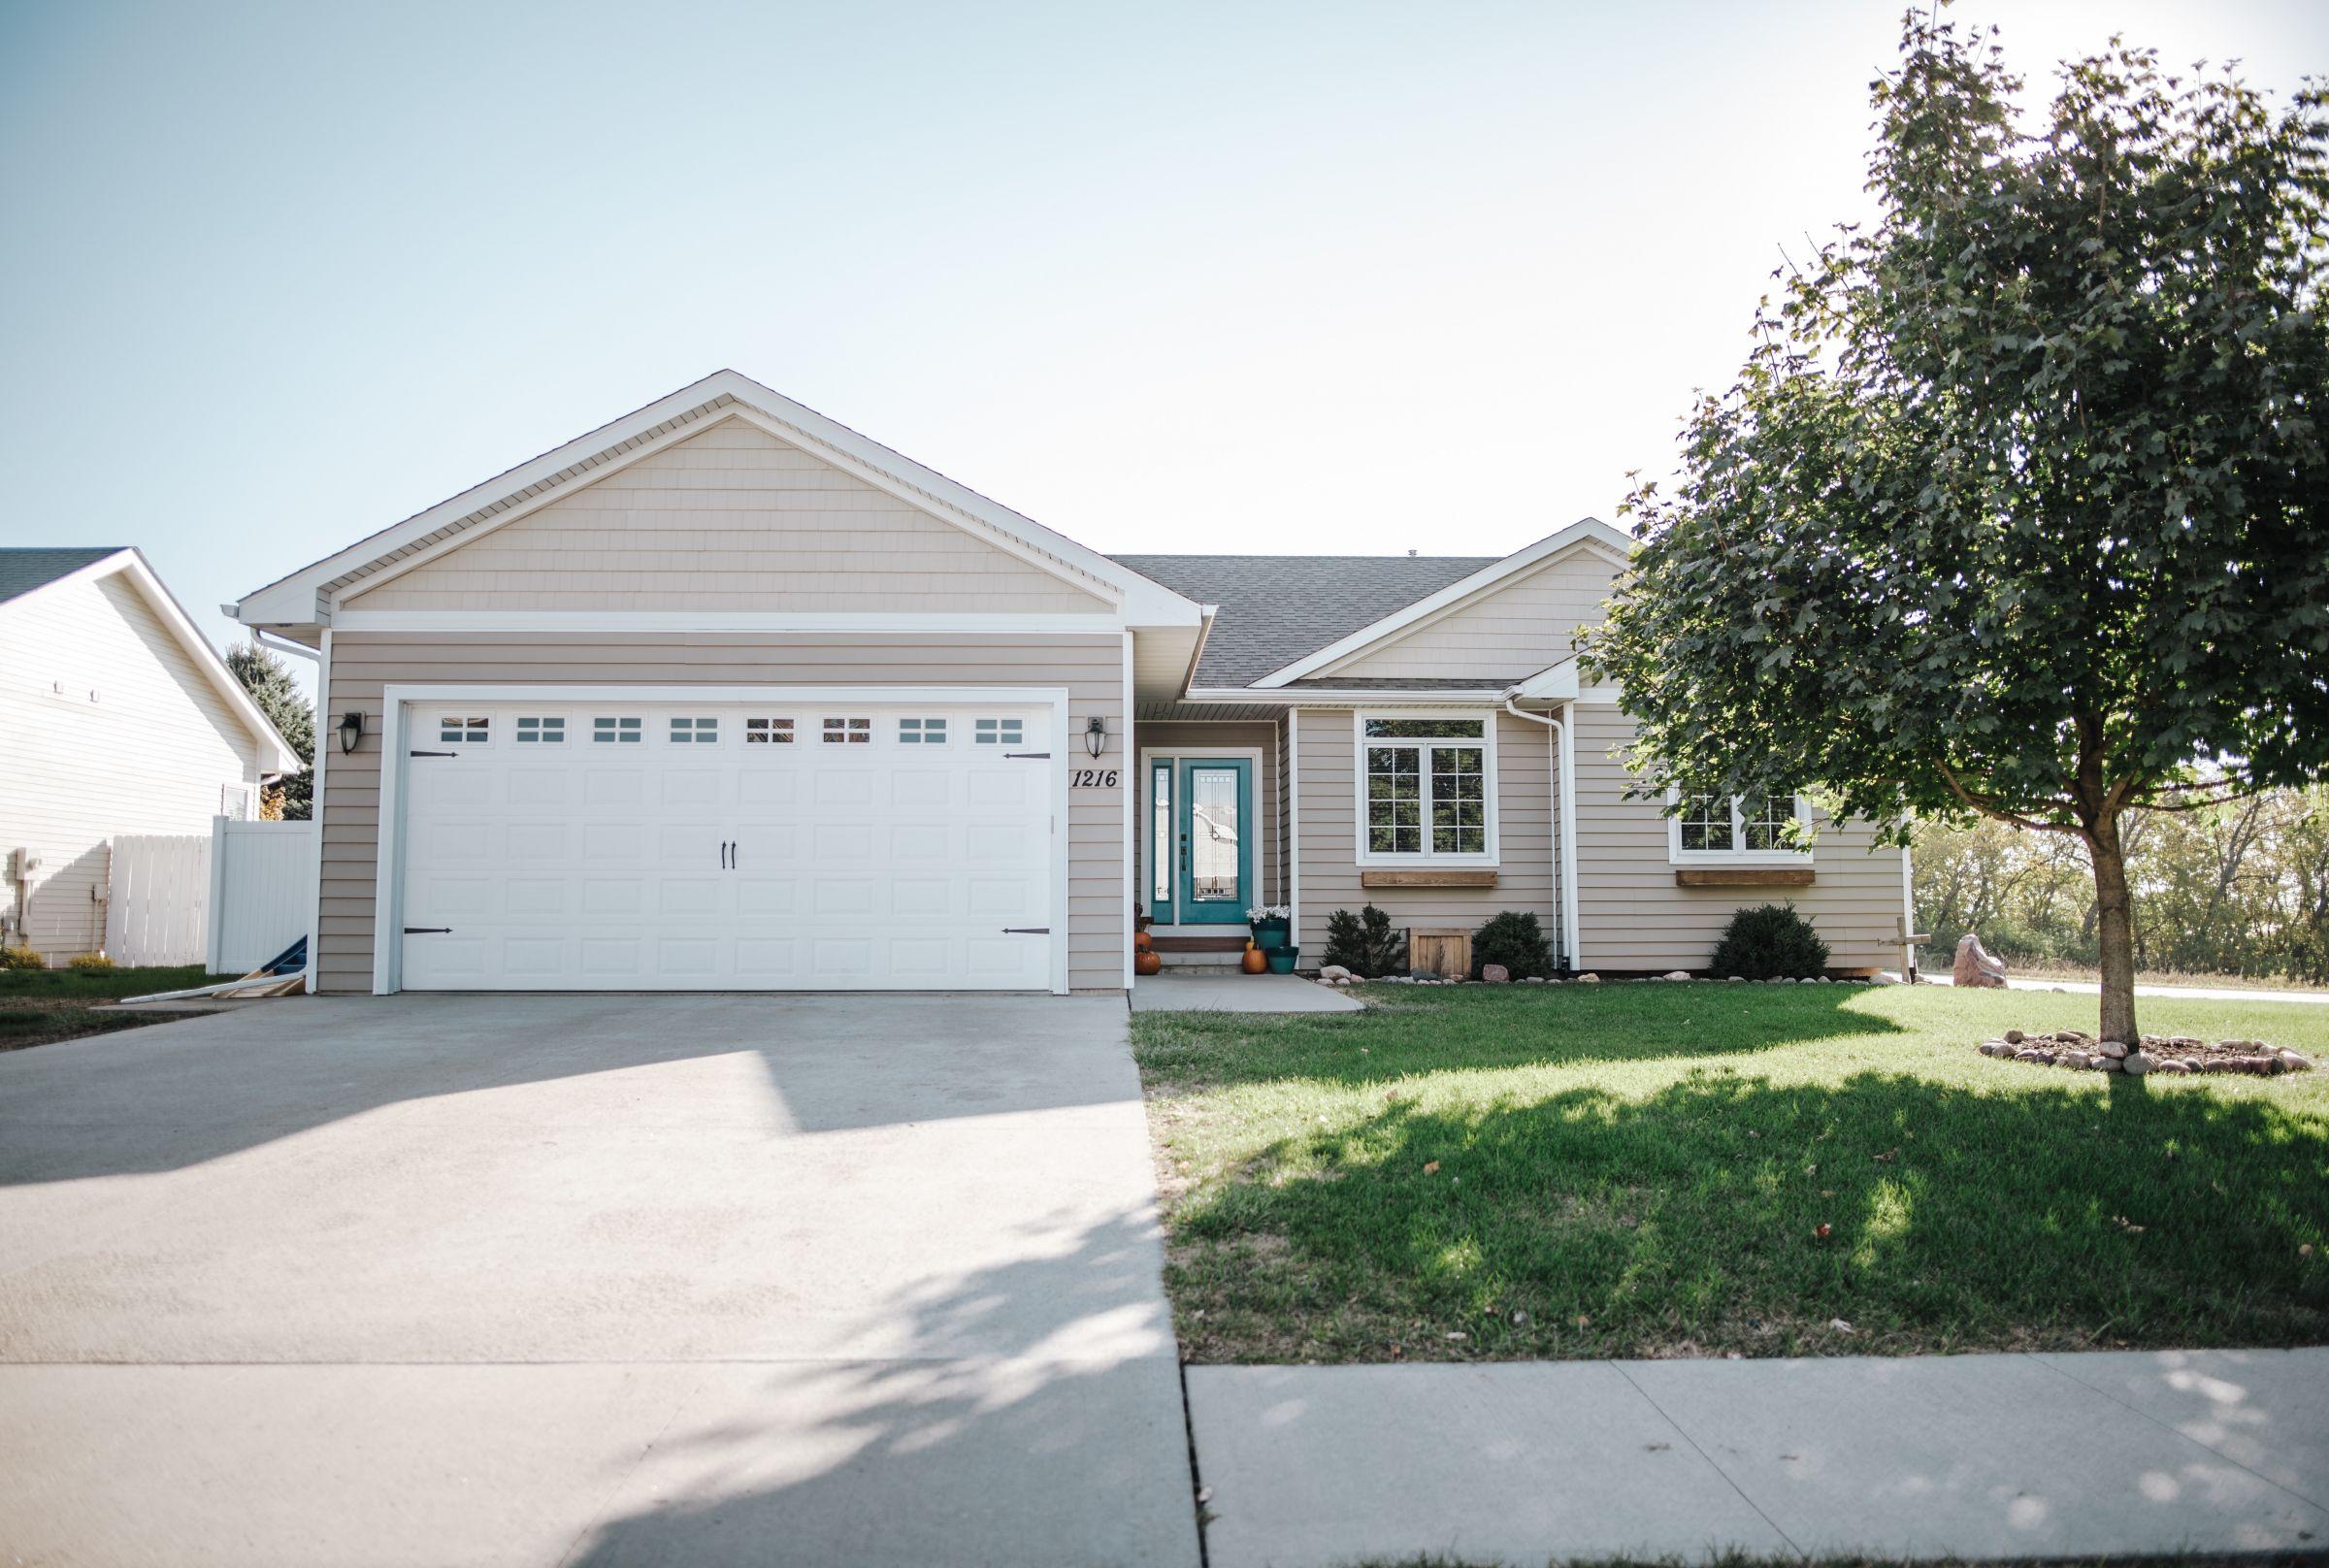 residential-warren-county-iowa-0-acres-listing-number-15204-1-2020-10-09-190525.jpg